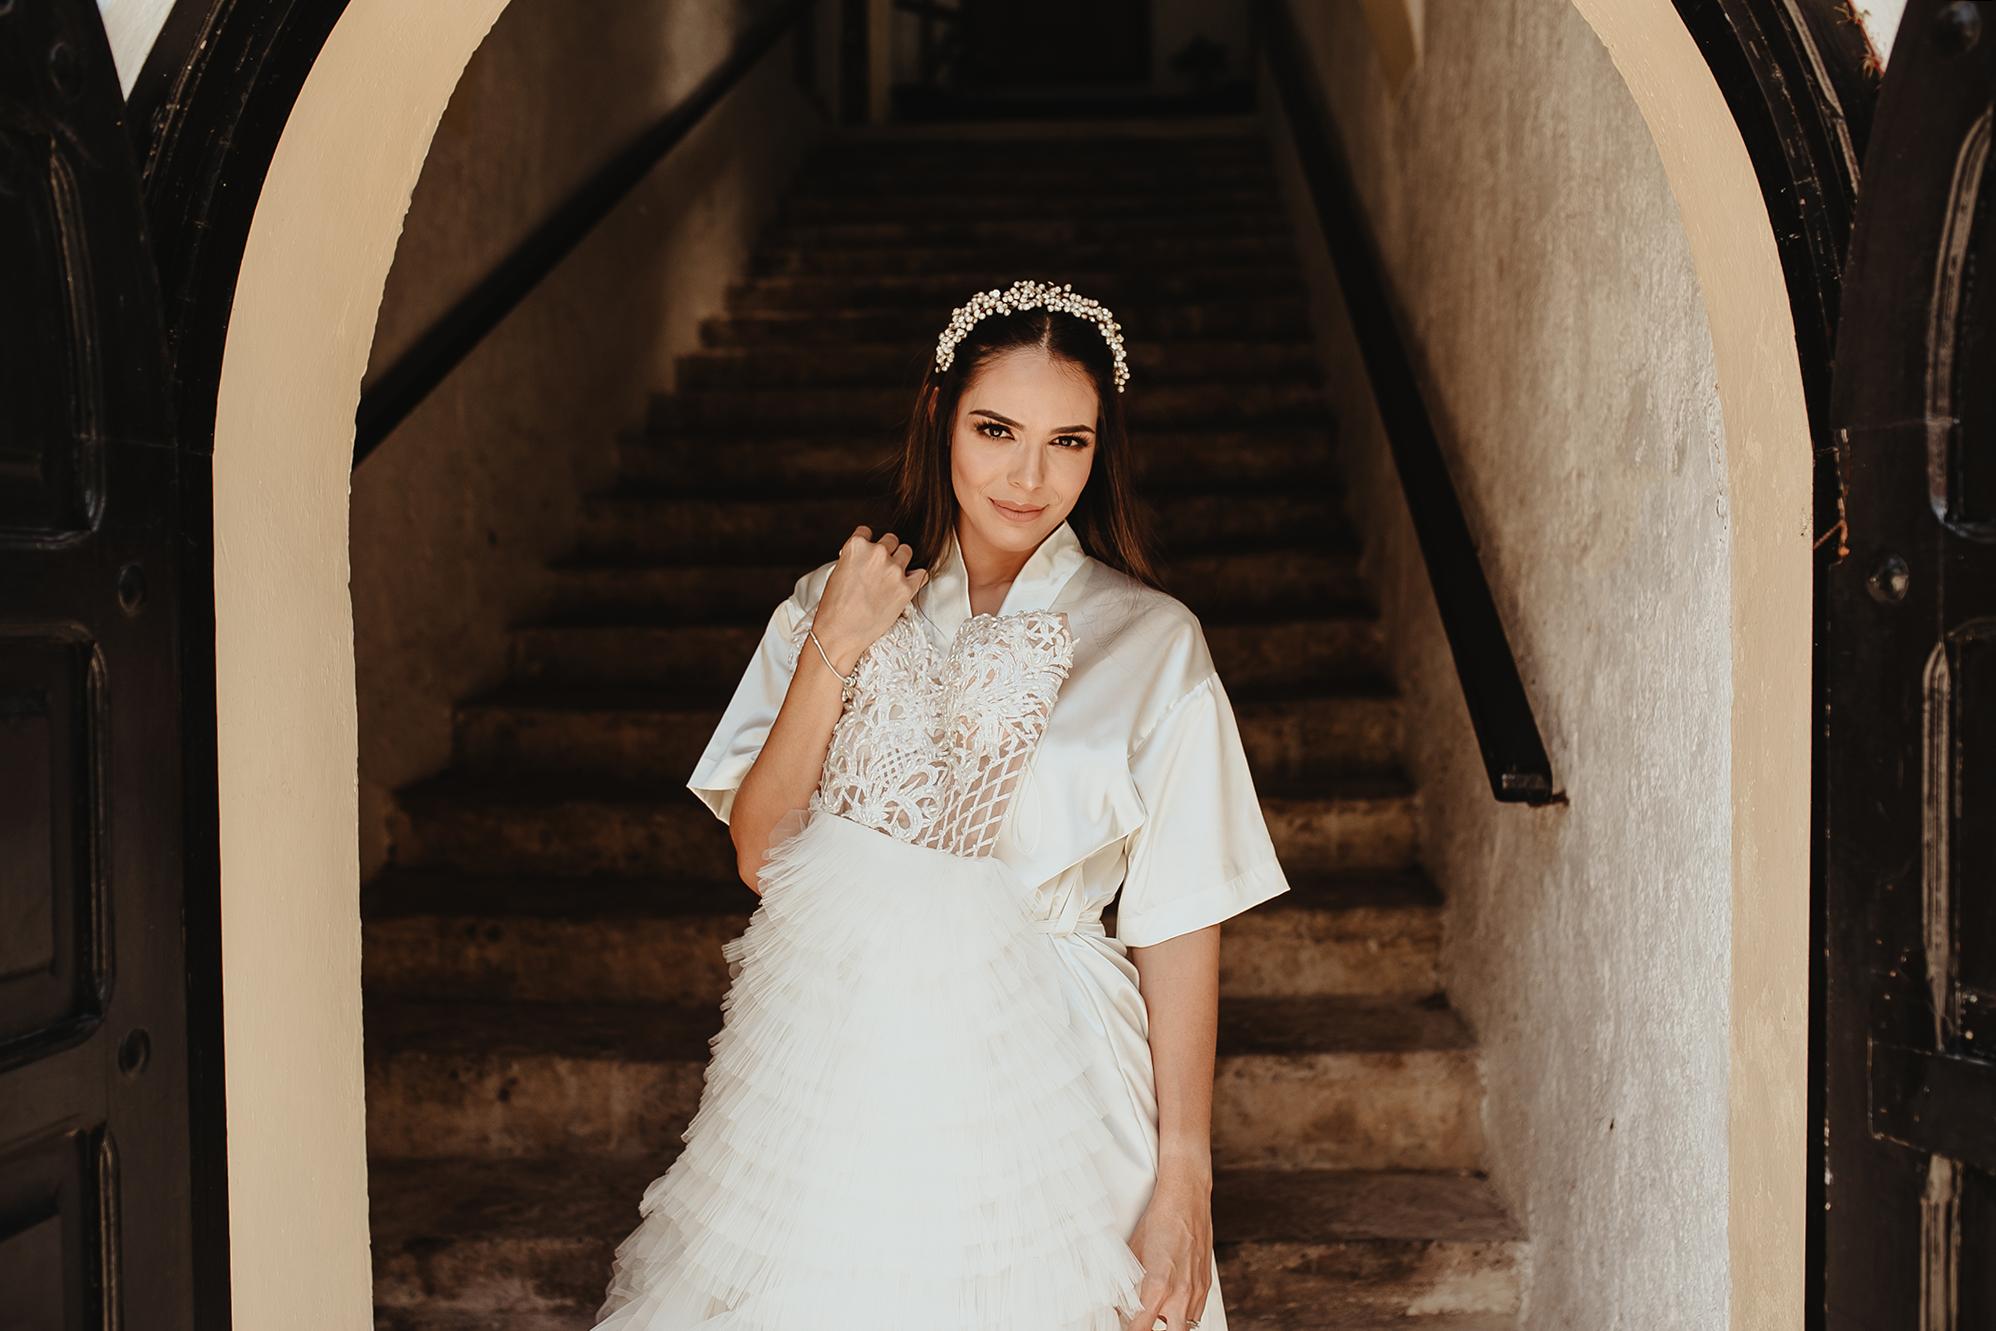 0080R&F__WeddingDestination_Weddingmerida_BodaMexico_FotografoDeBodas_FabrizioSimoneenFotografo.jpg